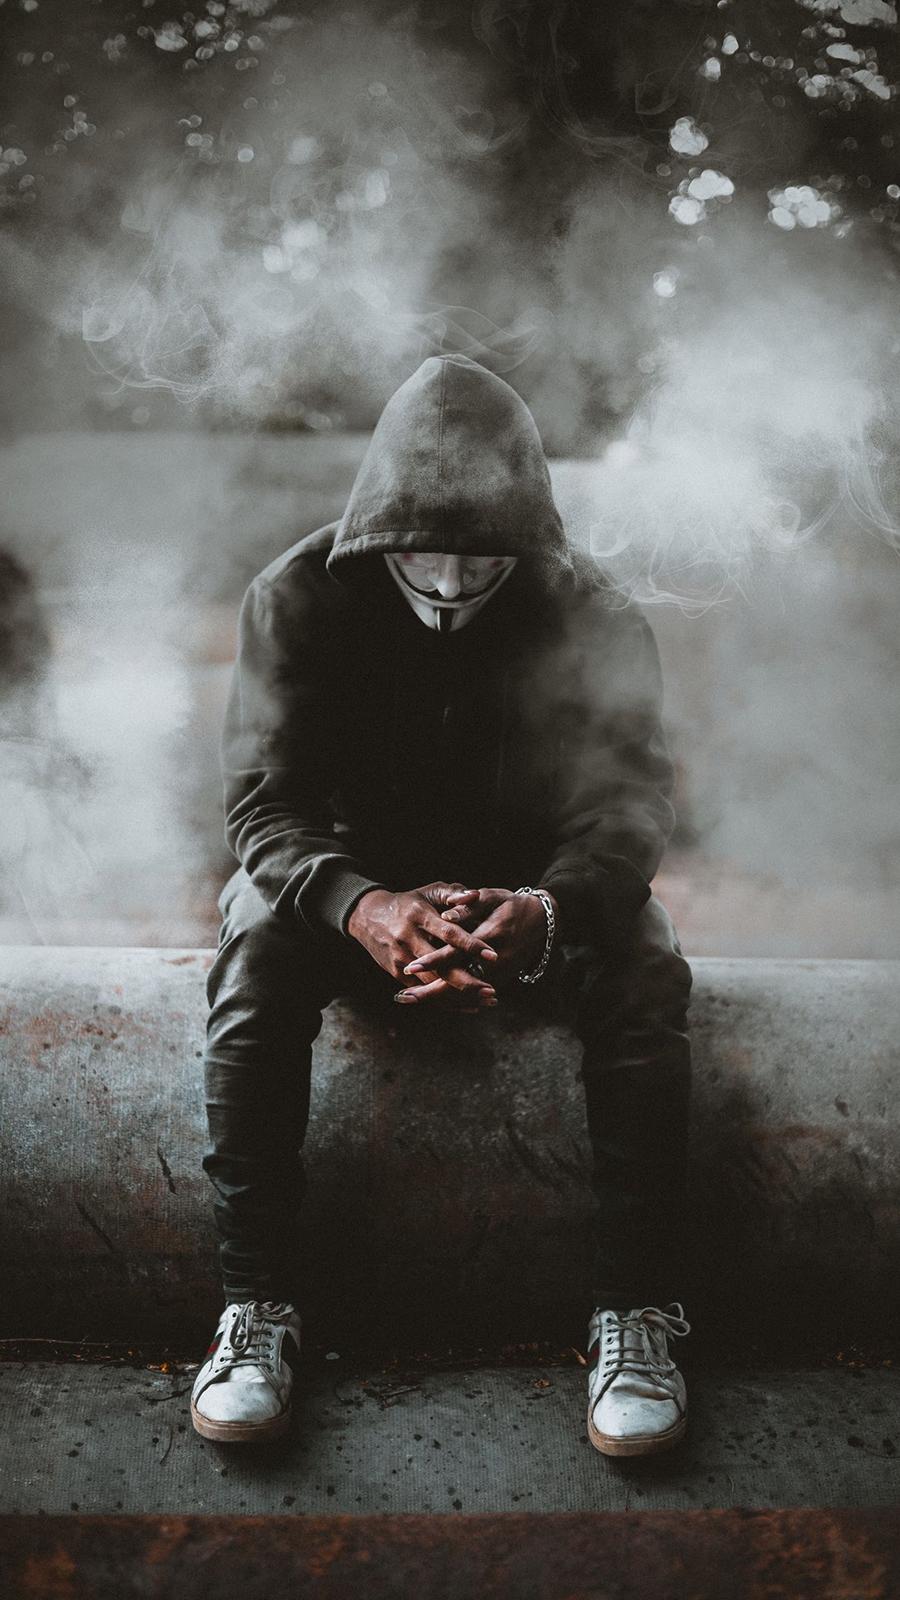 Masked Man Wallpapers Free Download